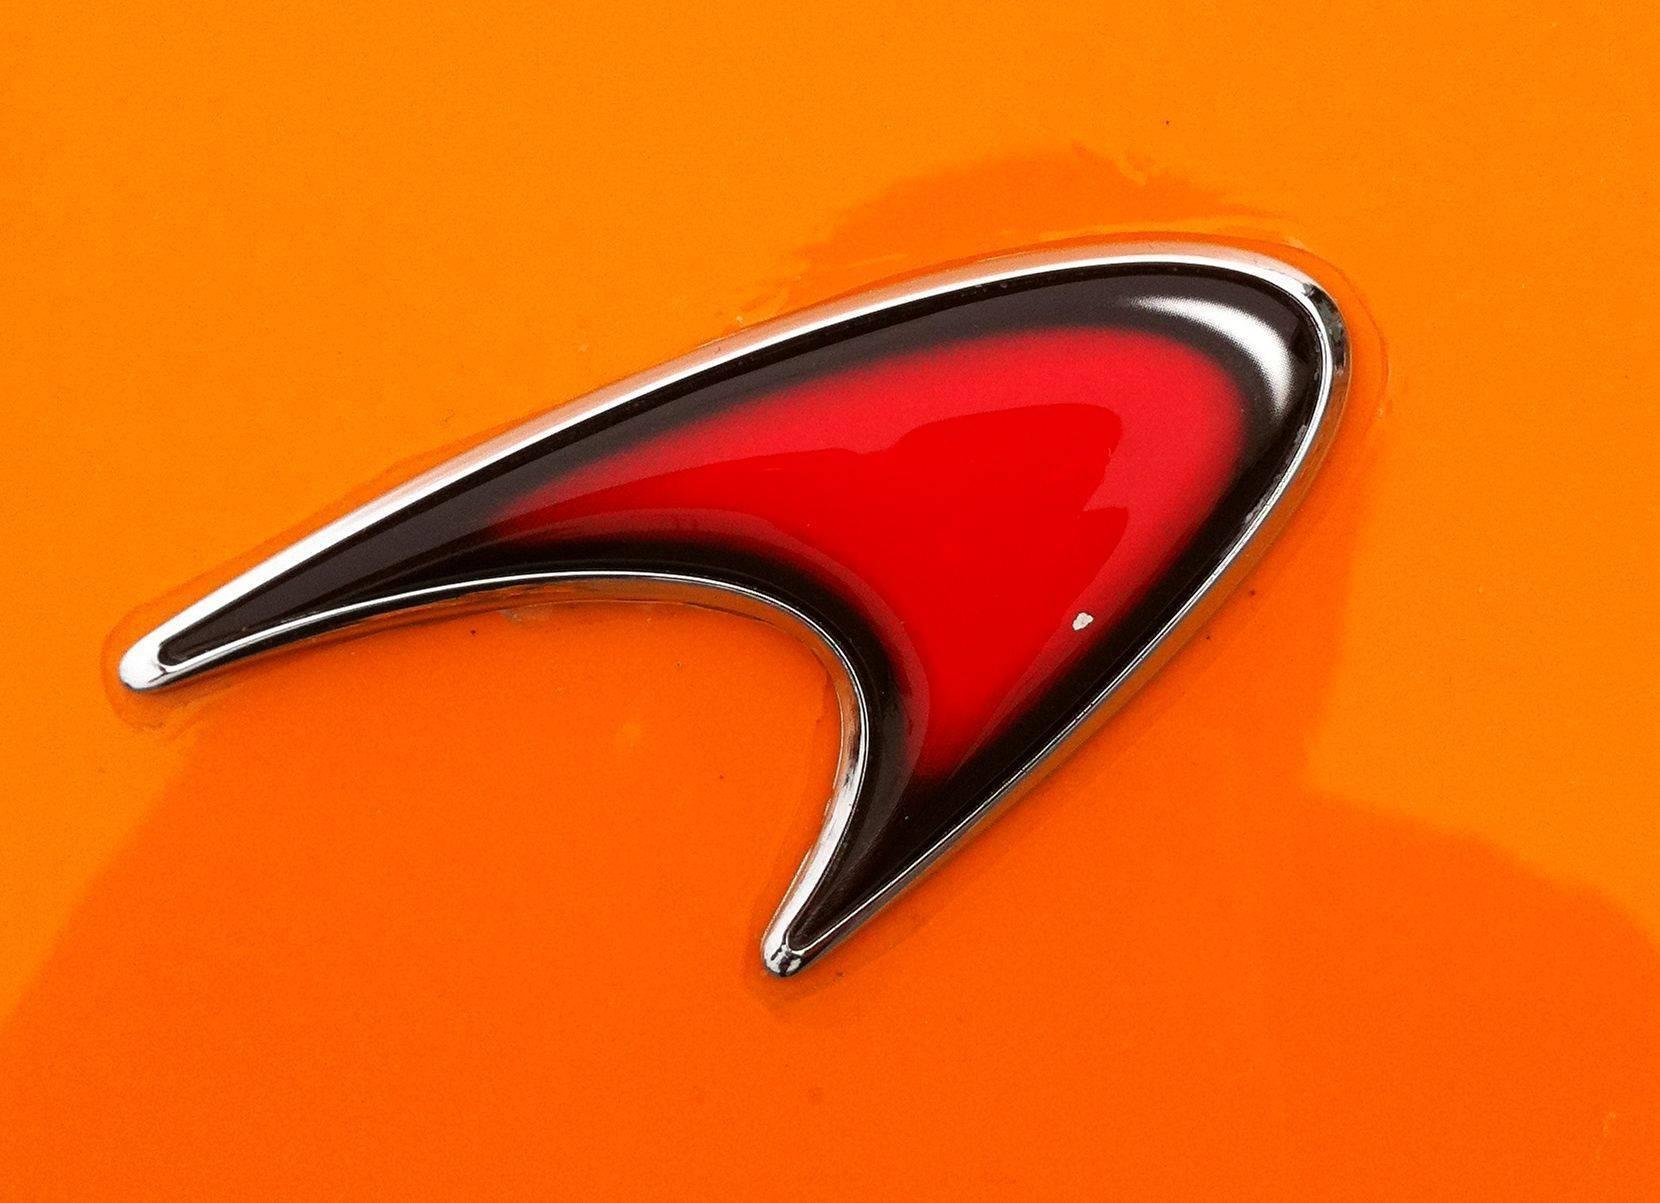 [Imagen: McLarenLogoNaranja.jpg]